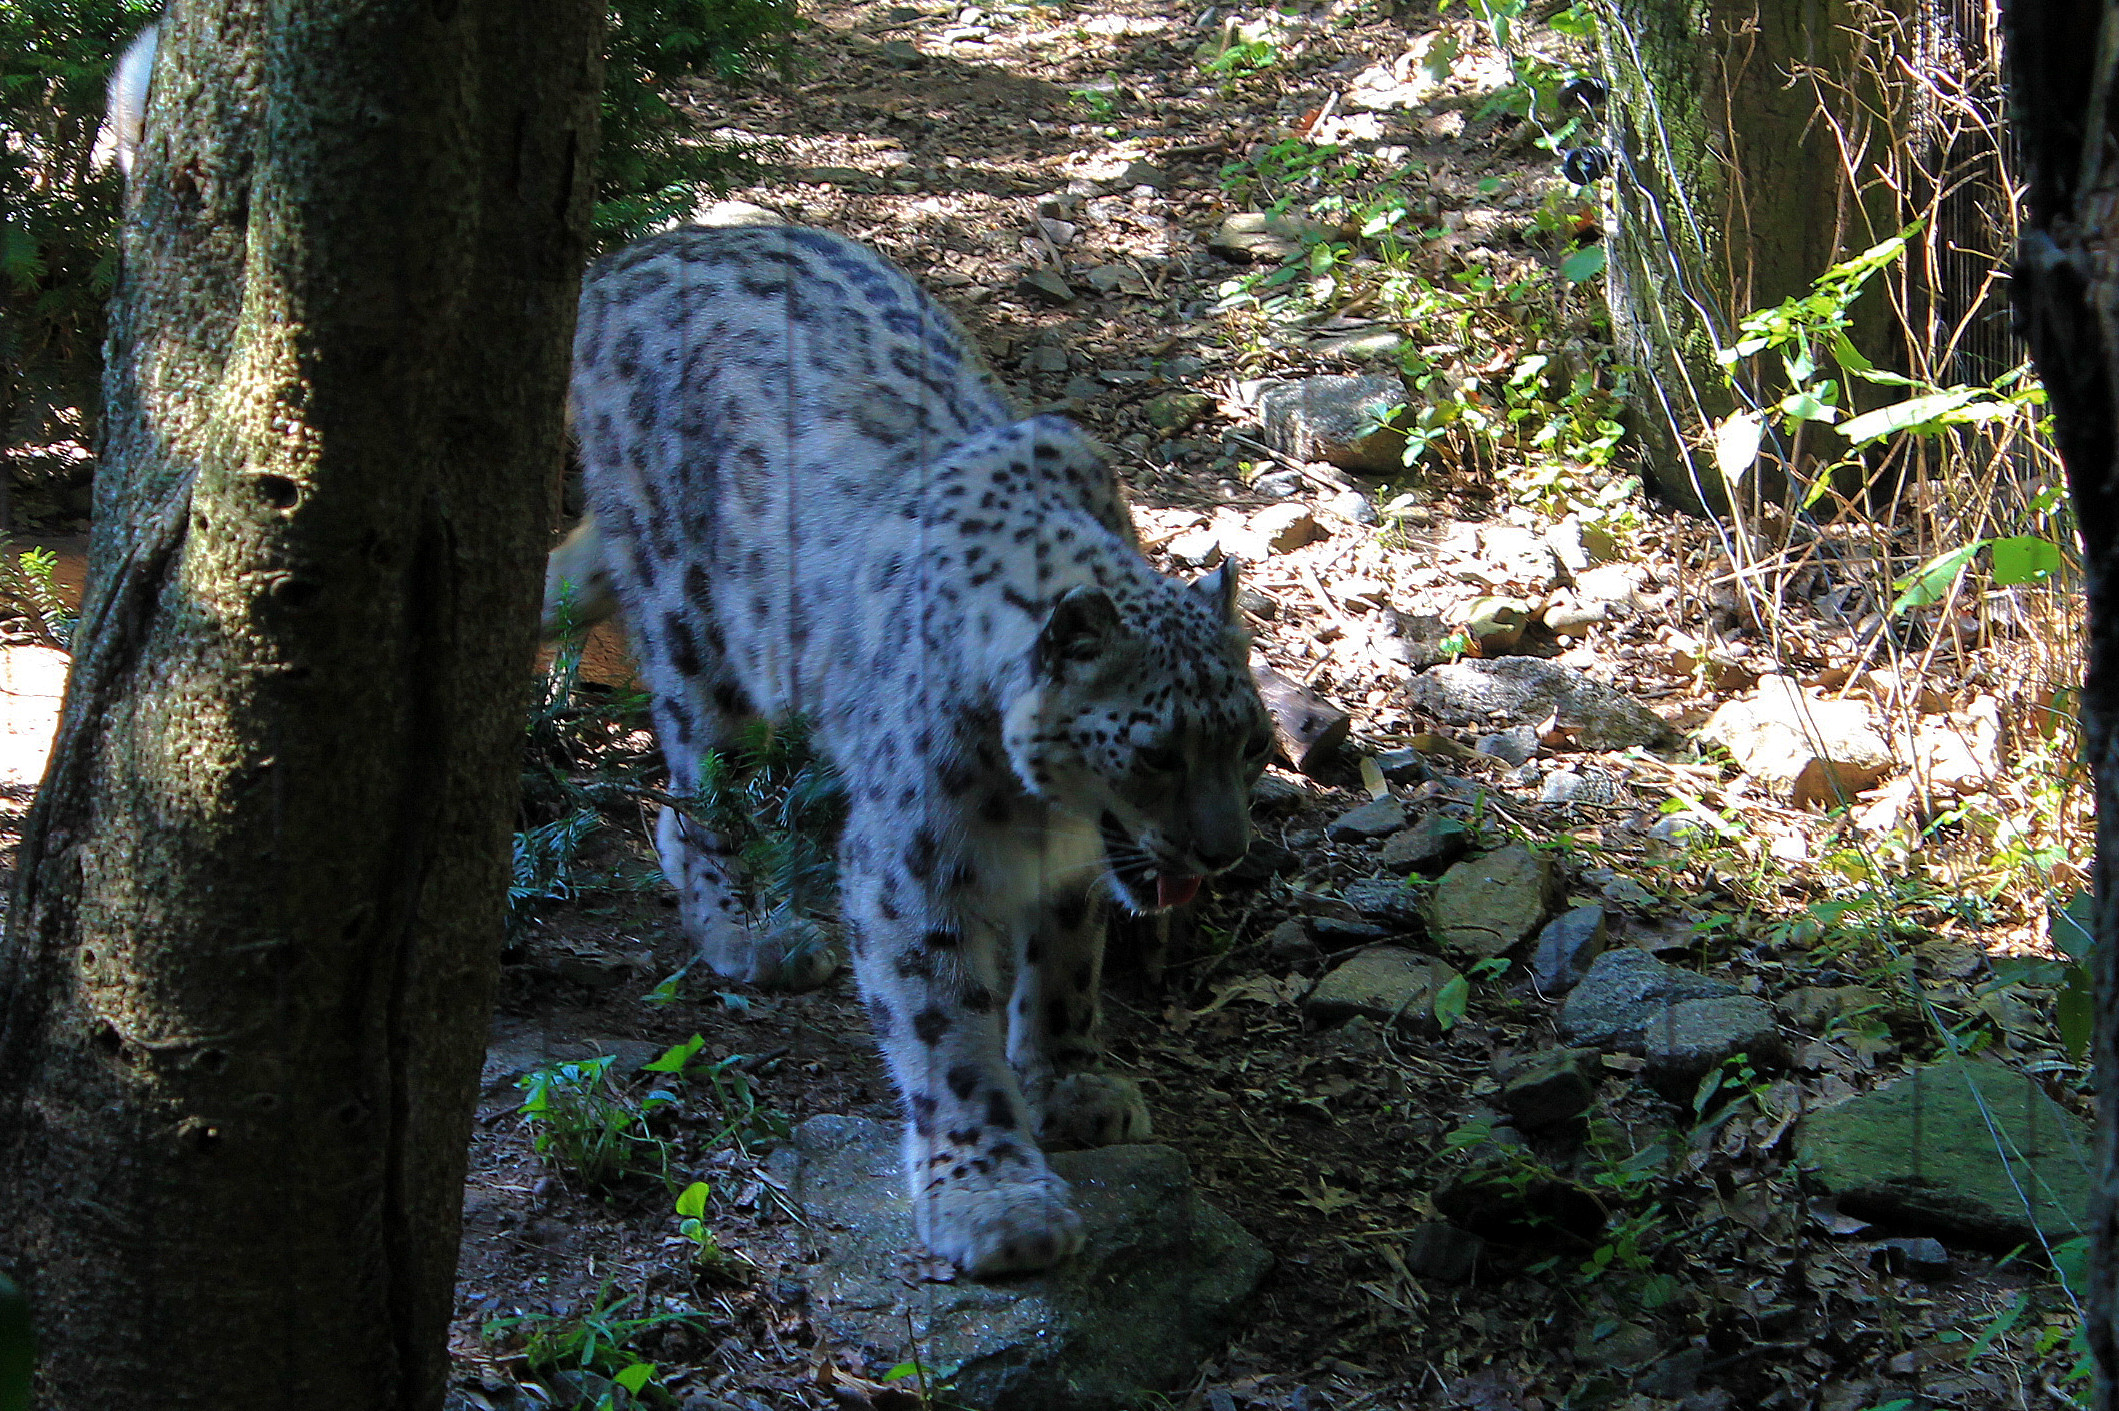 bronxsnowleopard